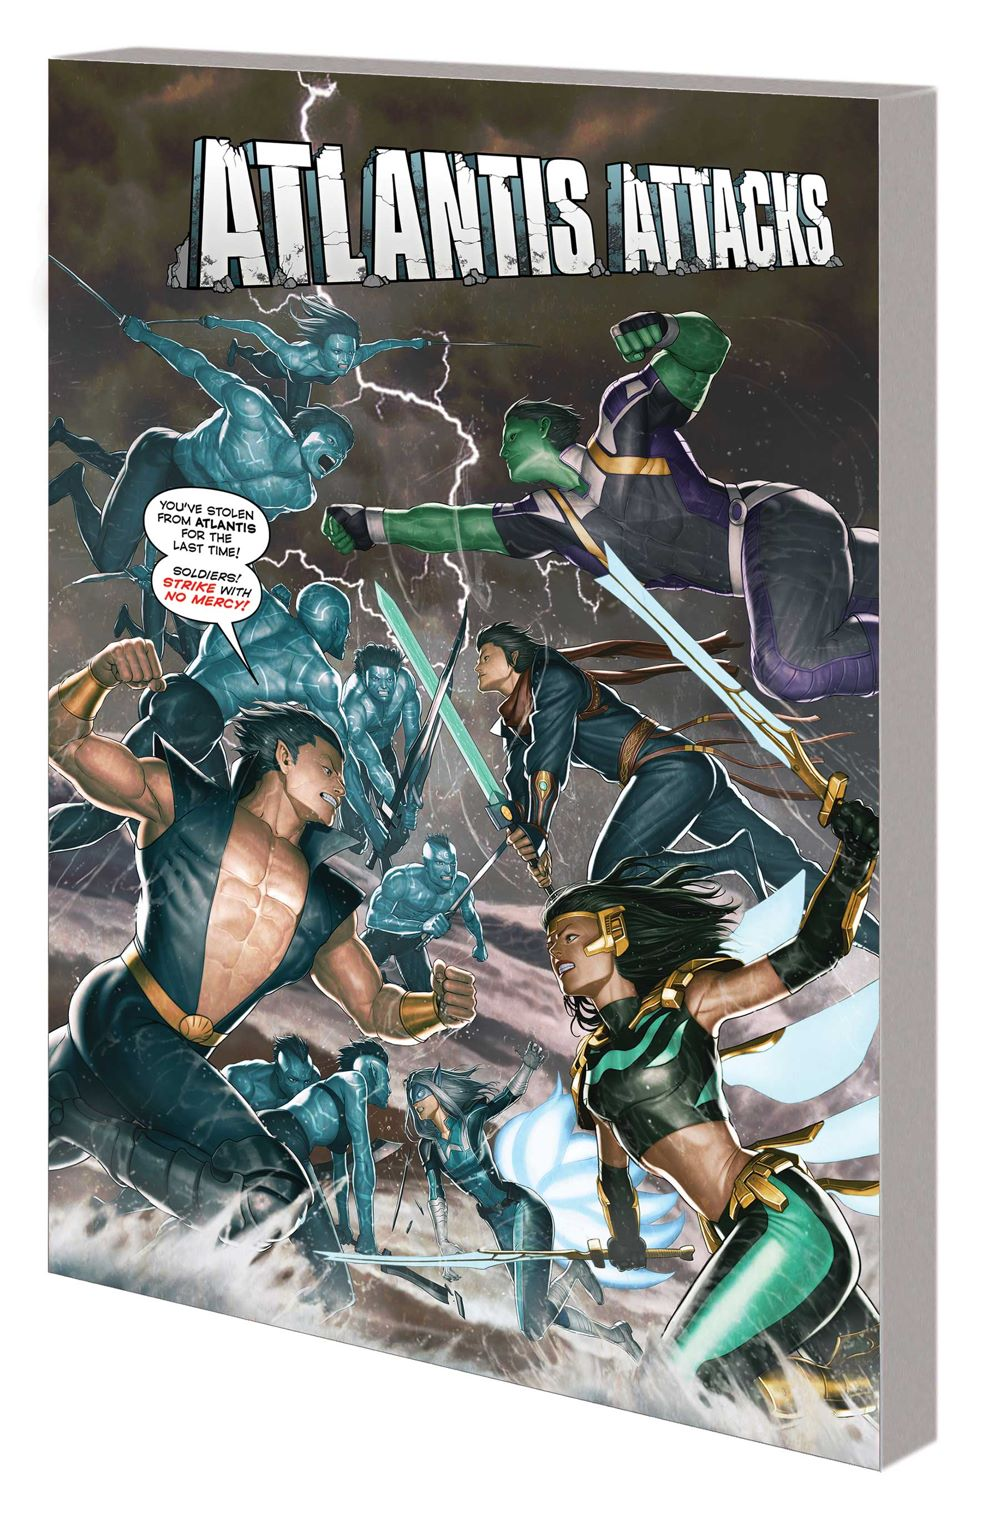 ATLANTISATTACKS_TPB Marvel Comics January 2021 Solicitations